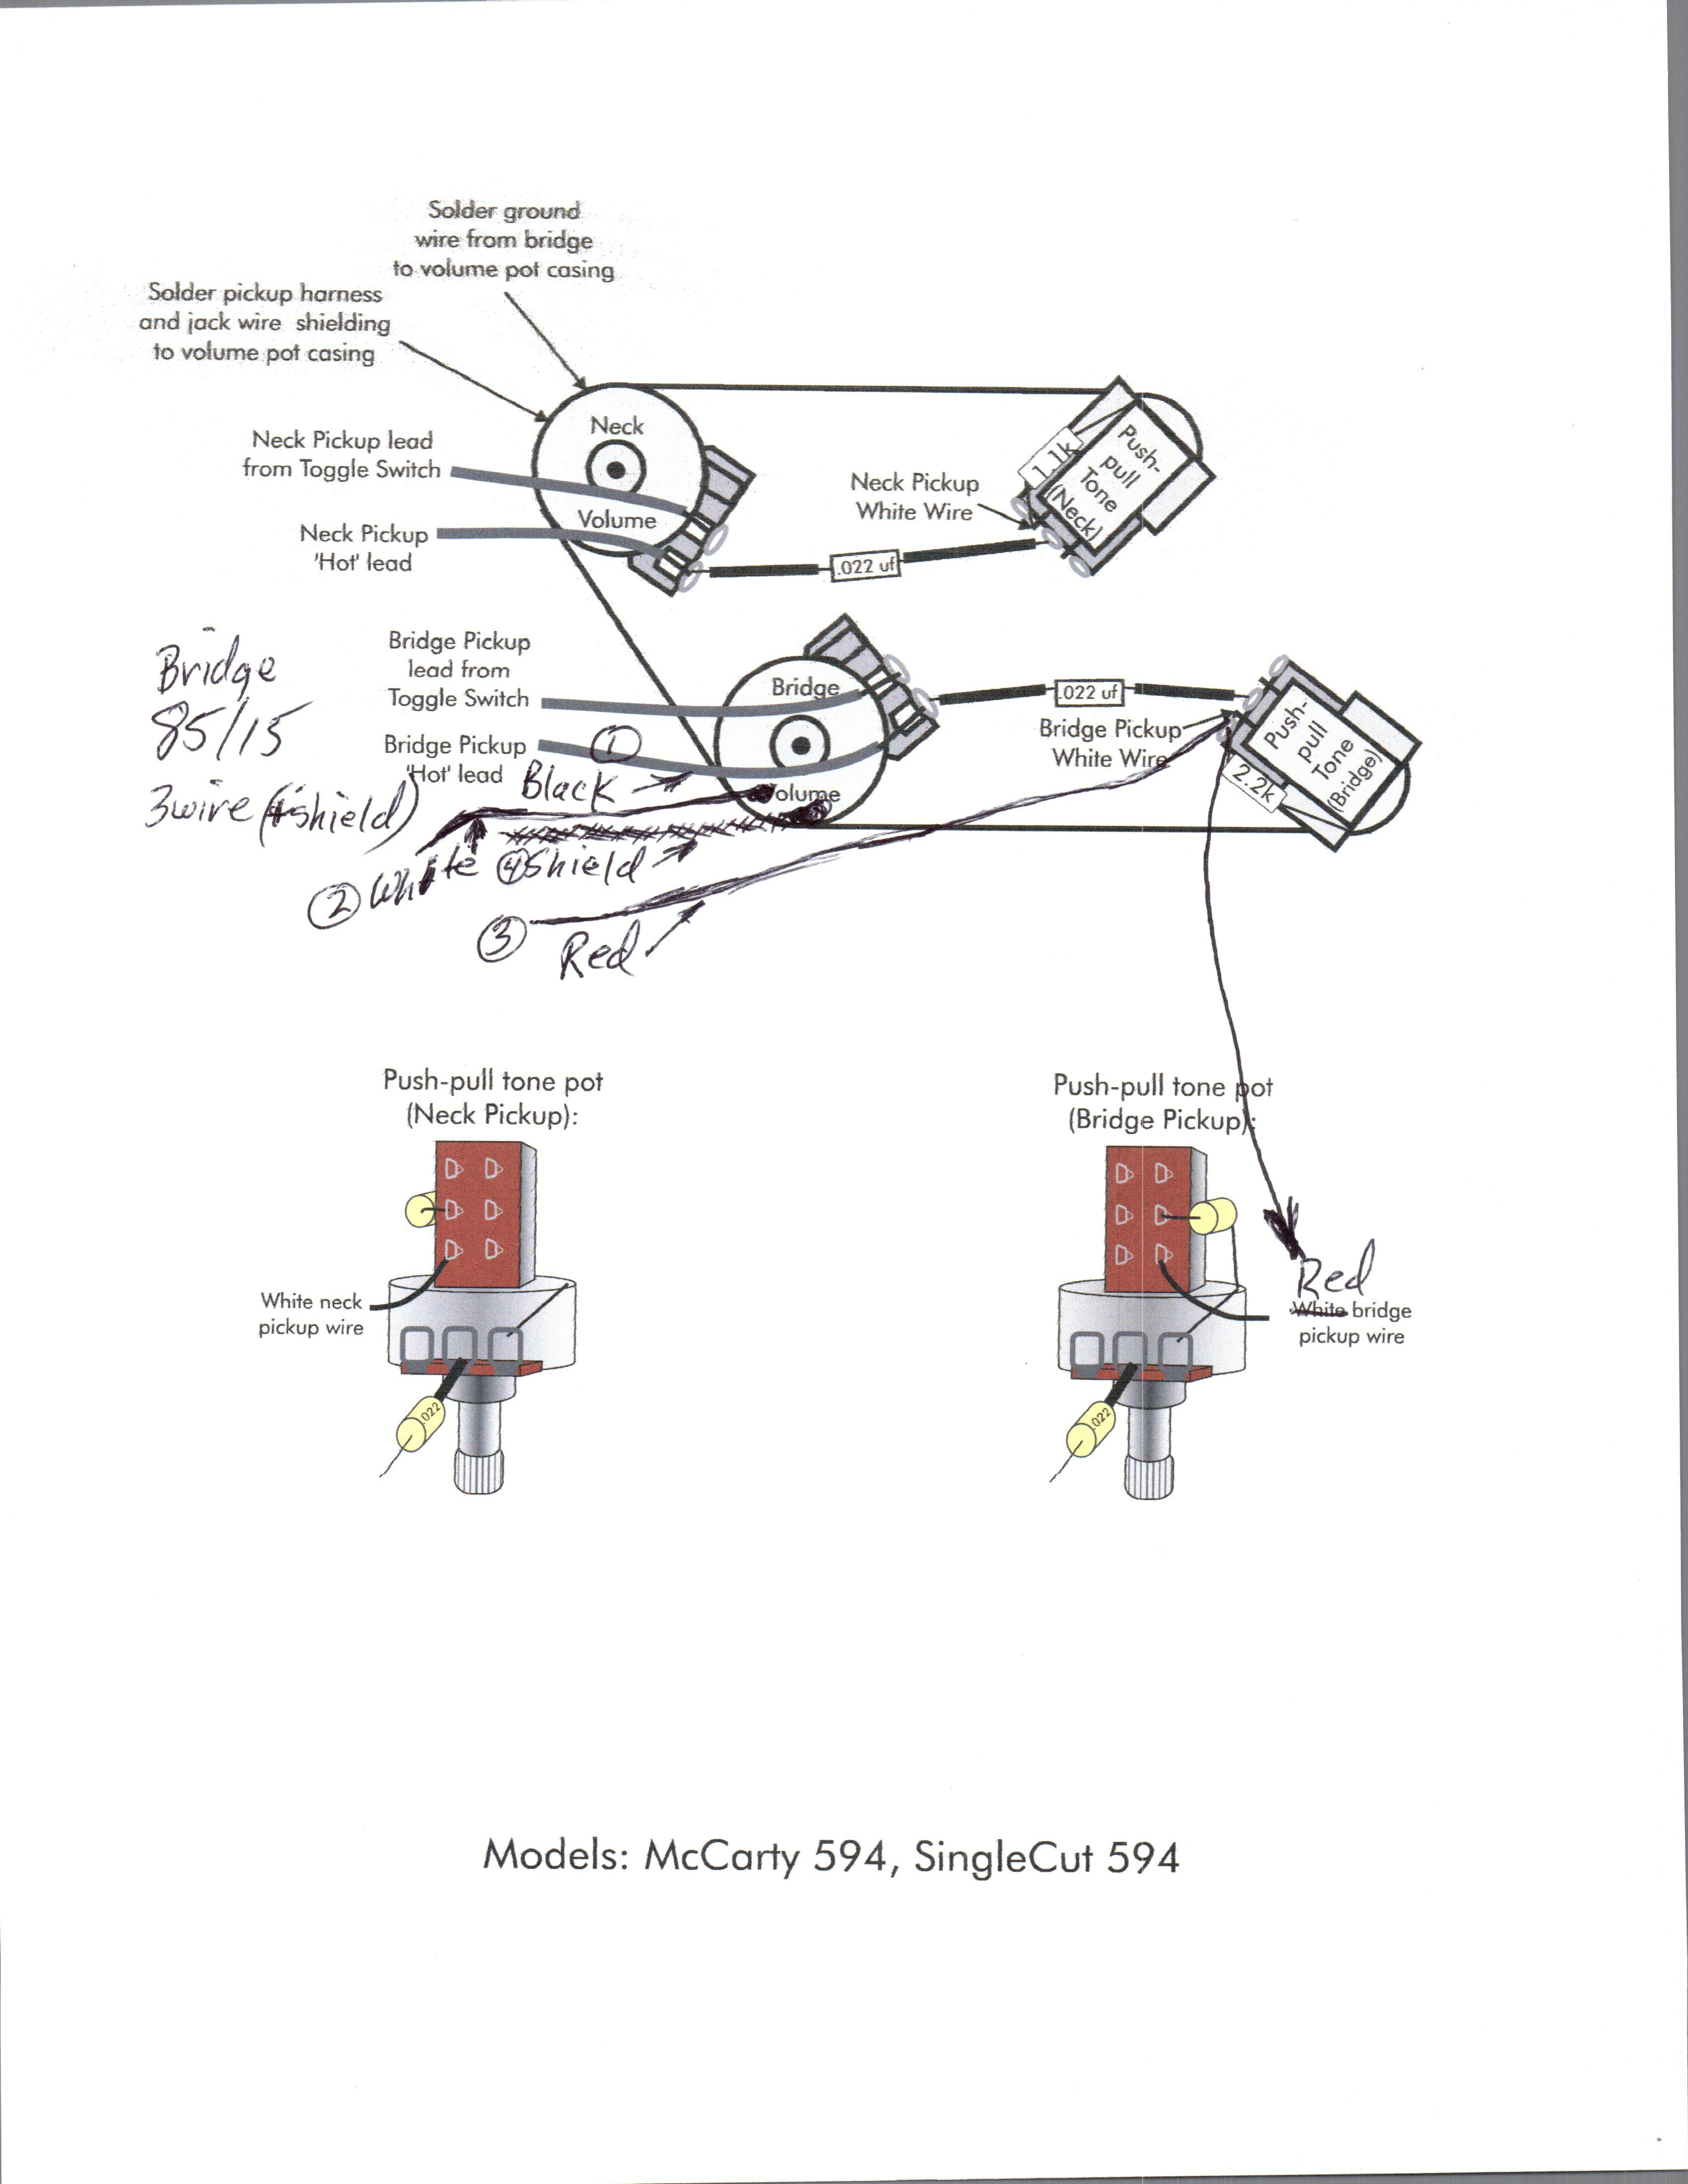 [DIAGRAM_3NM]  FE_2316] Prs Se Custom Guitar Wiring Diagrams   Wiring Diagram Prs Sc245      Ricis Crove Greas Benkeme Mohammedshrine Librar Wiring 101